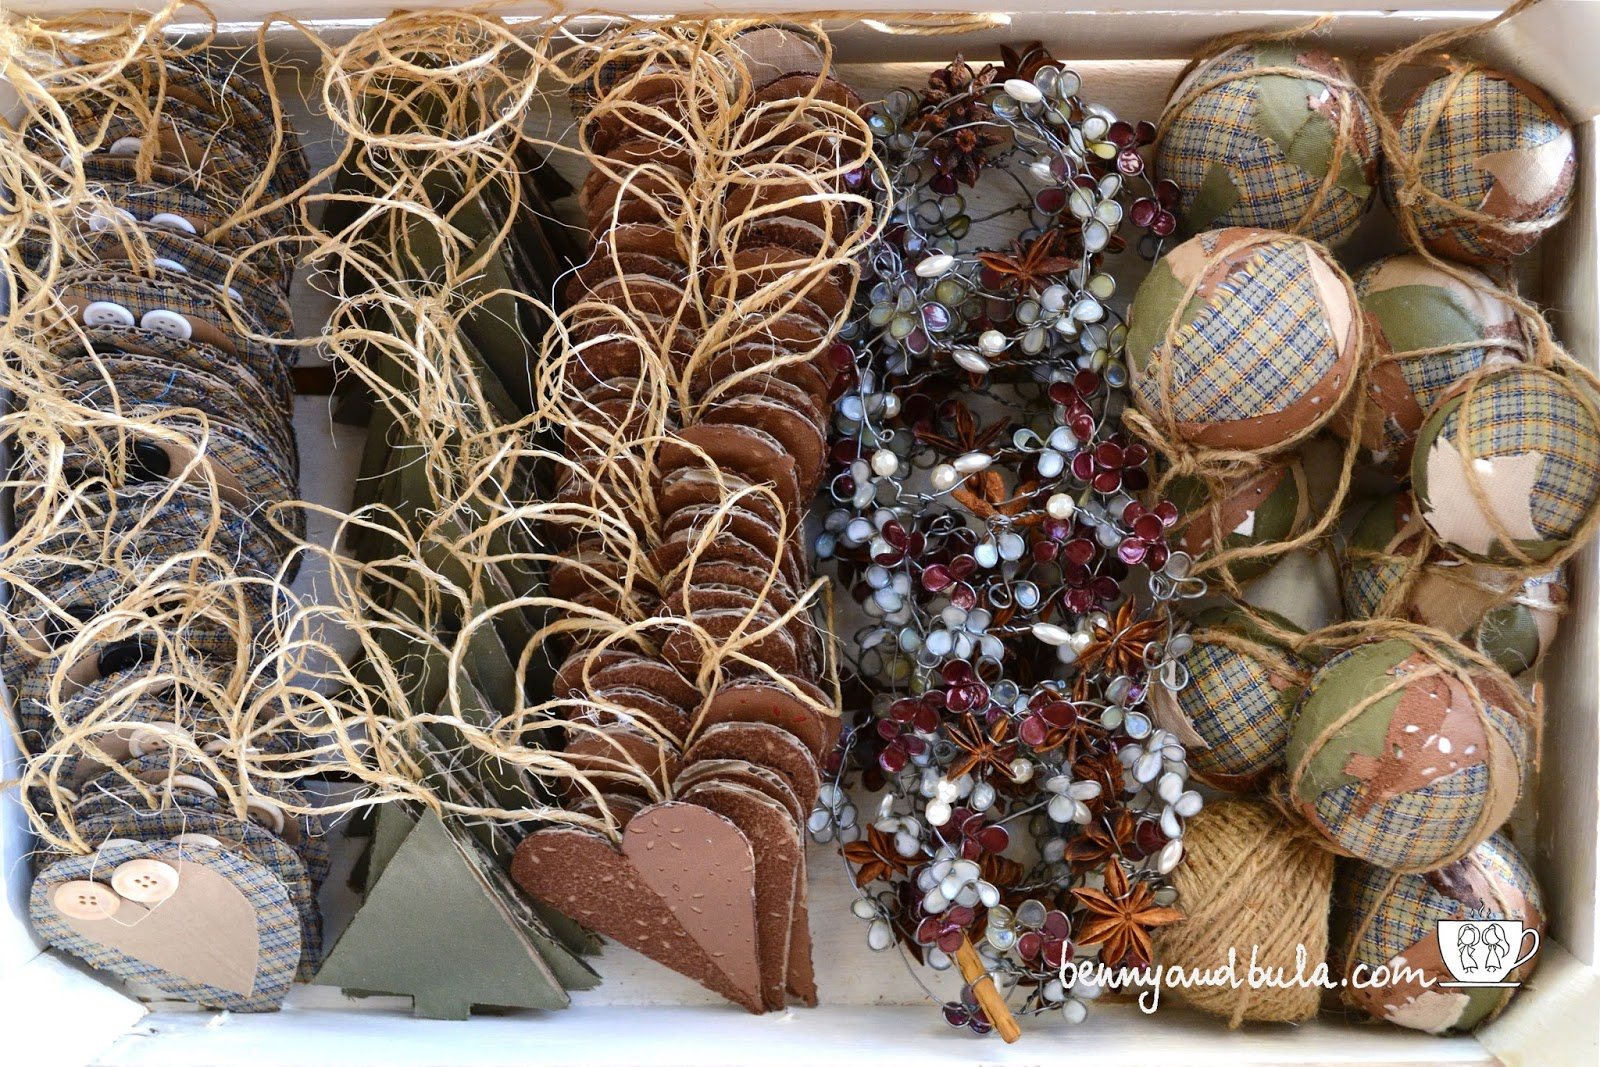 Decorazioni Natalizie Faidate/DIY Christmas Ornaments ideas